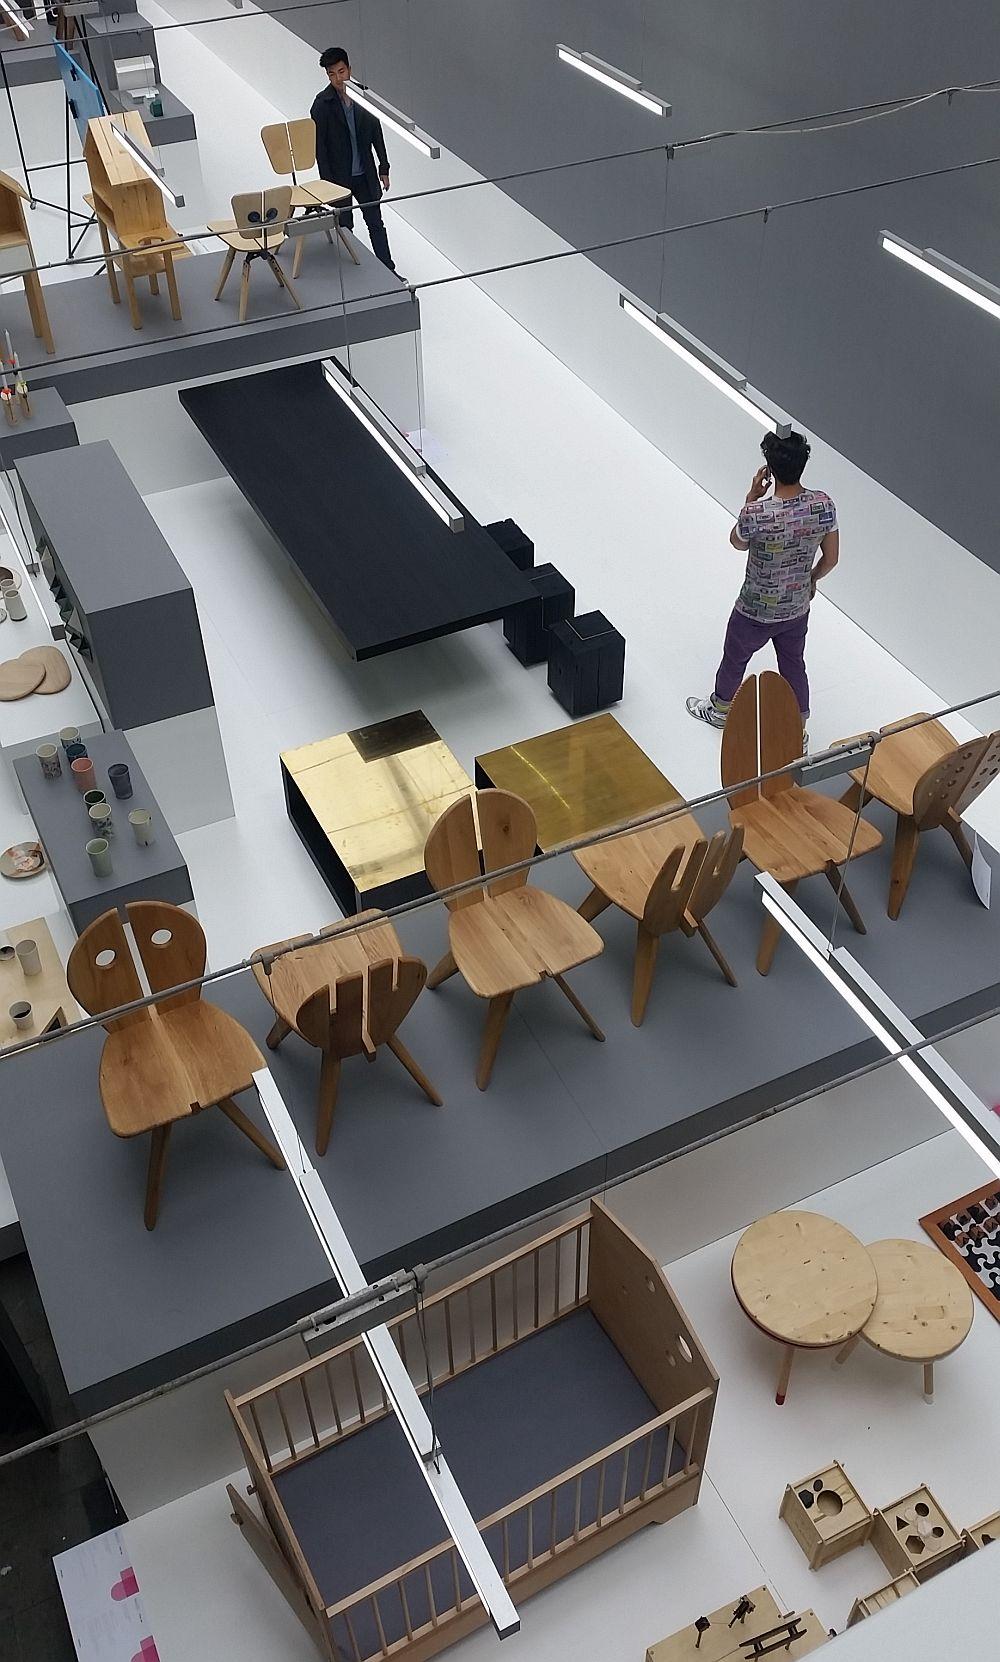 adelaparvu.com despre Romanian Design Week, Takim Chairs, designer arch Cristian Corvin